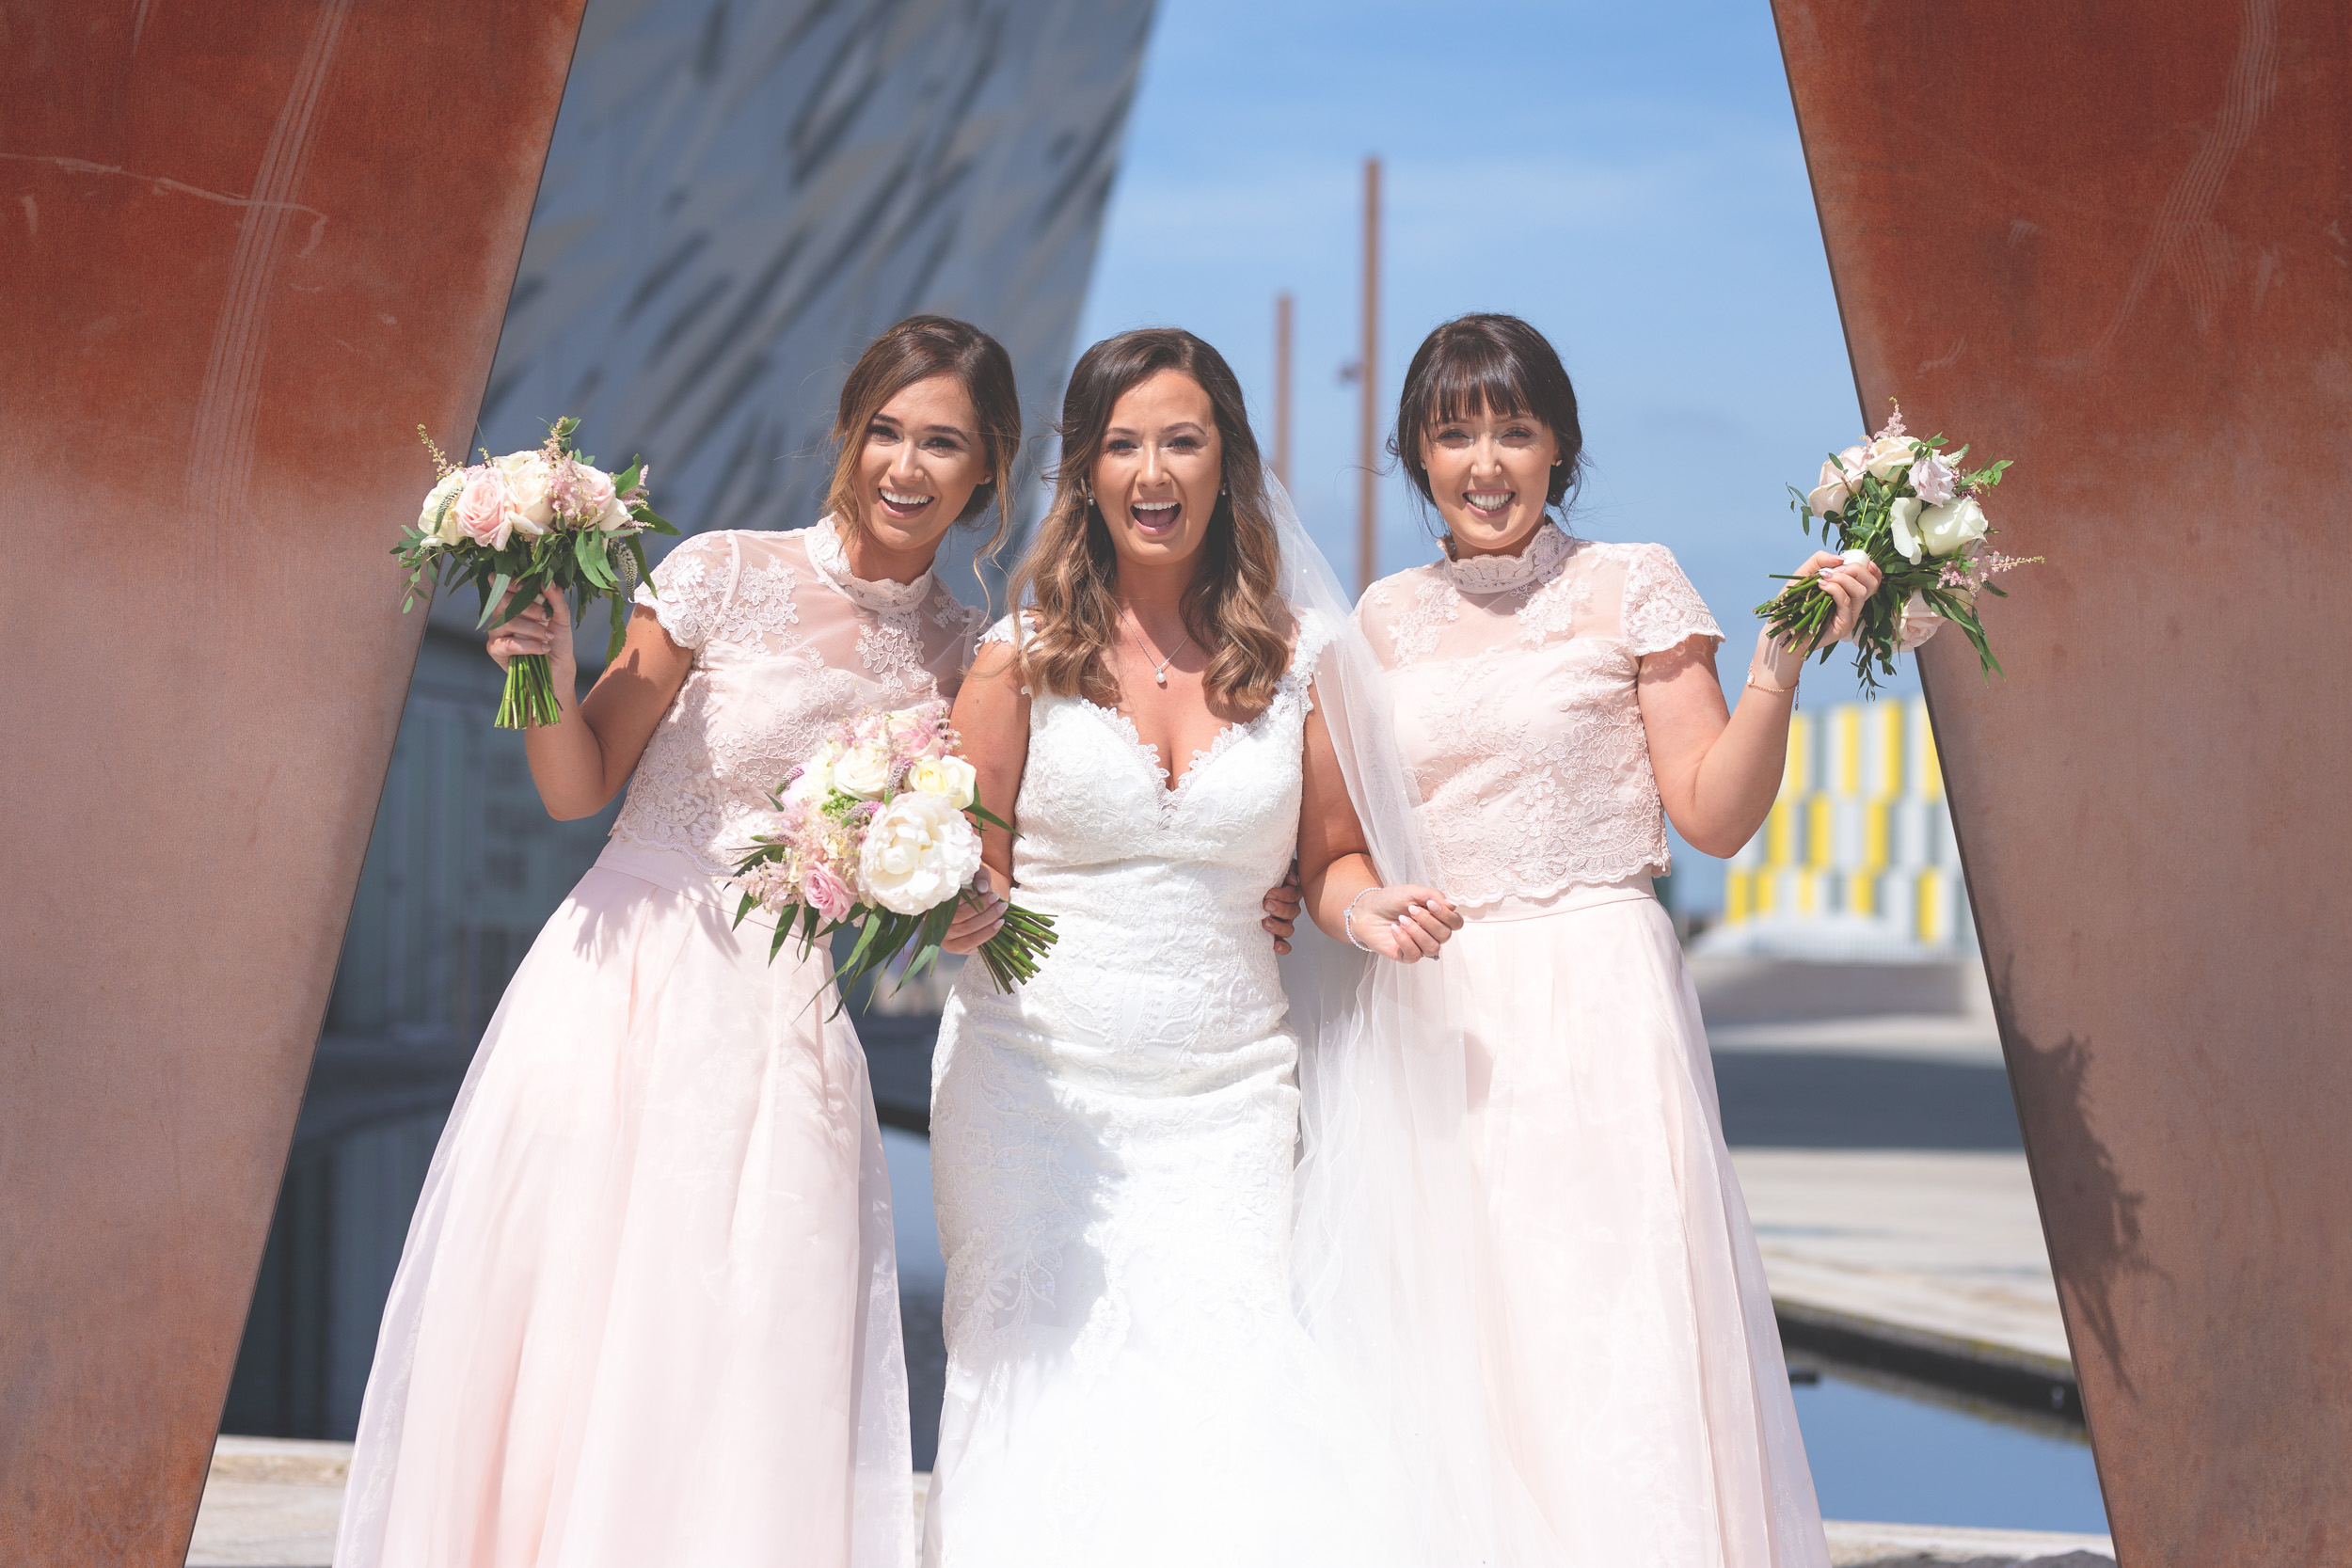 Brian McEwan   Northern Ireland Wedding Photographer   Rebecca & Michael   Portraits-68.jpg